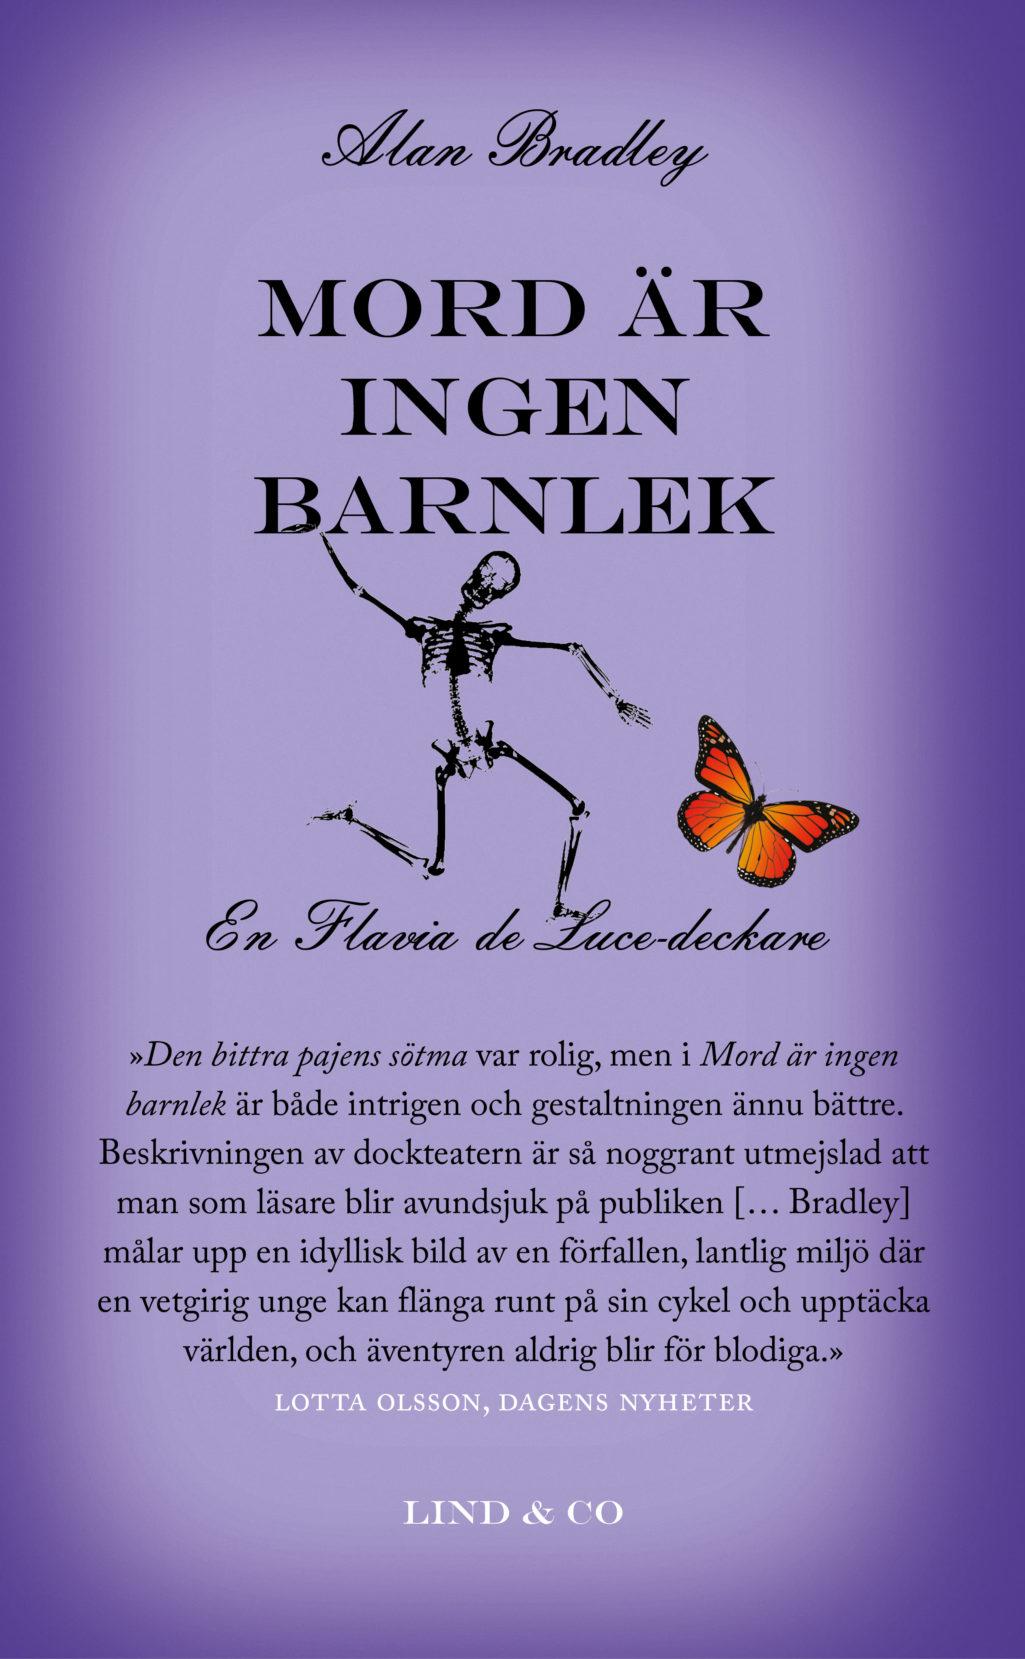 mord_ar_ingen_barnlek_pocket_framsida